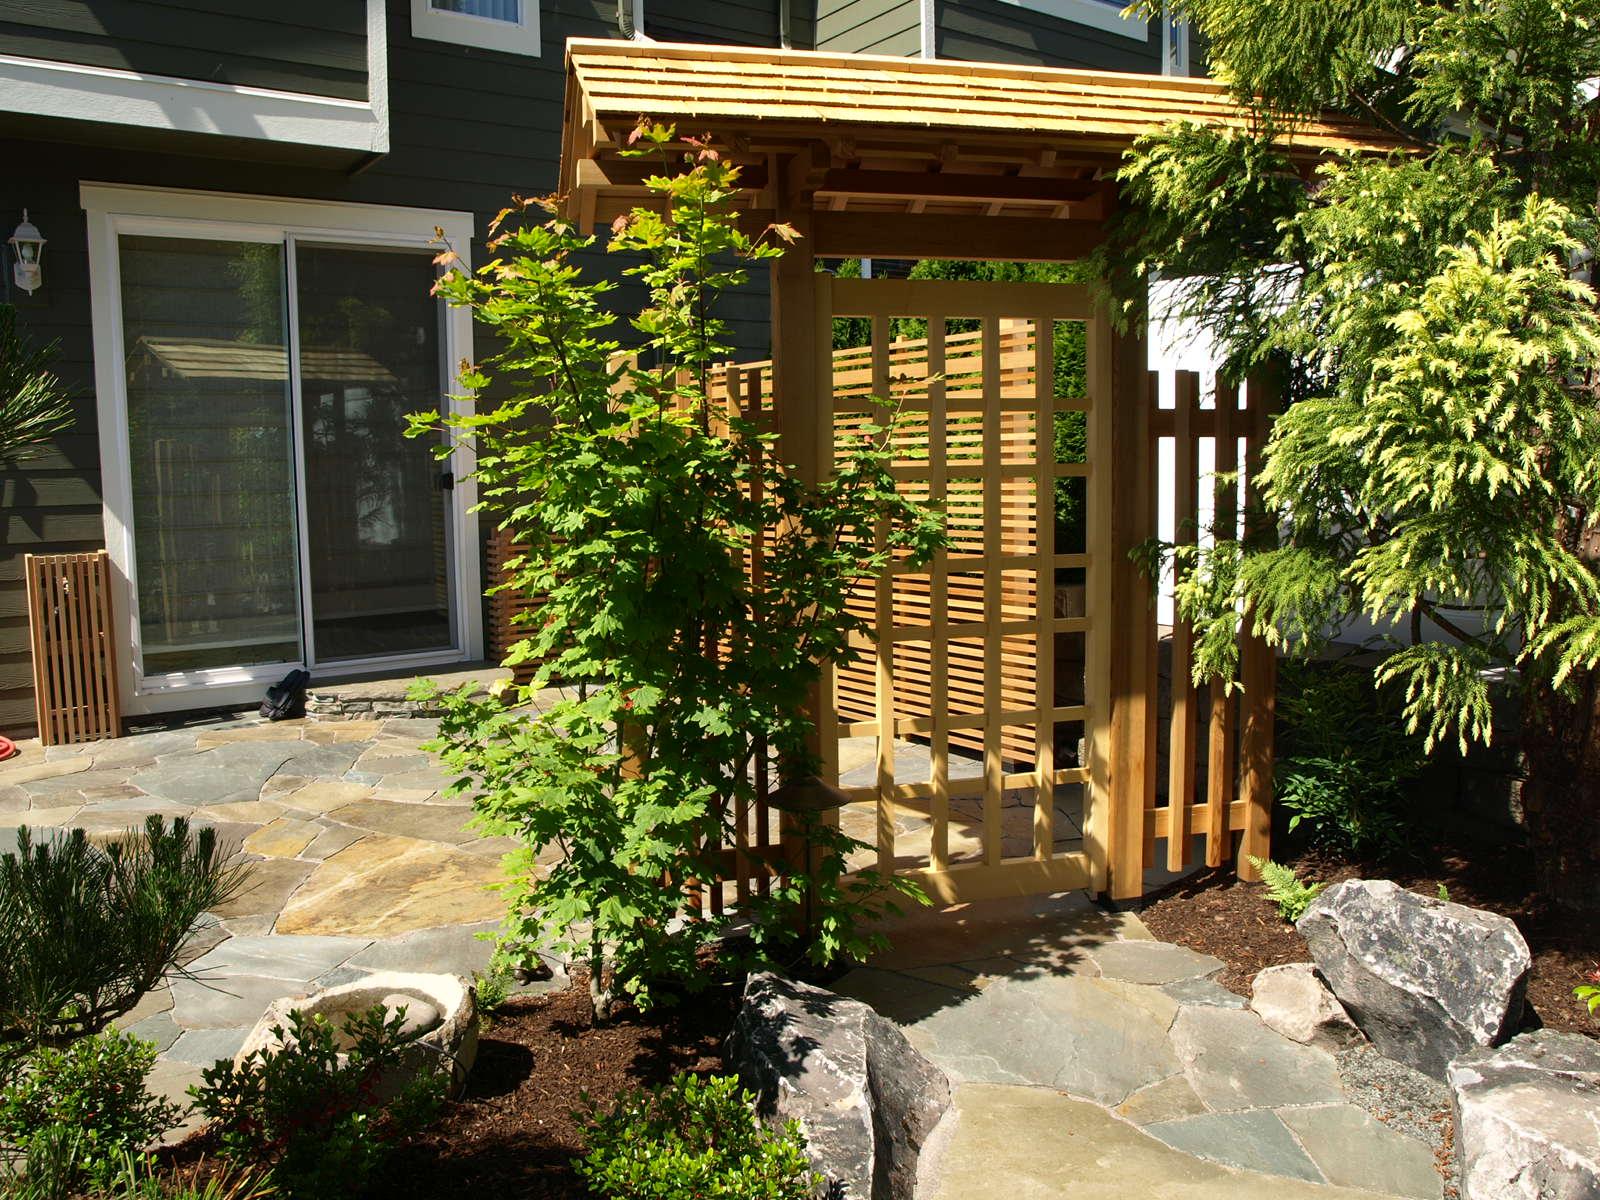 variegated-bluestone-patio.JPG